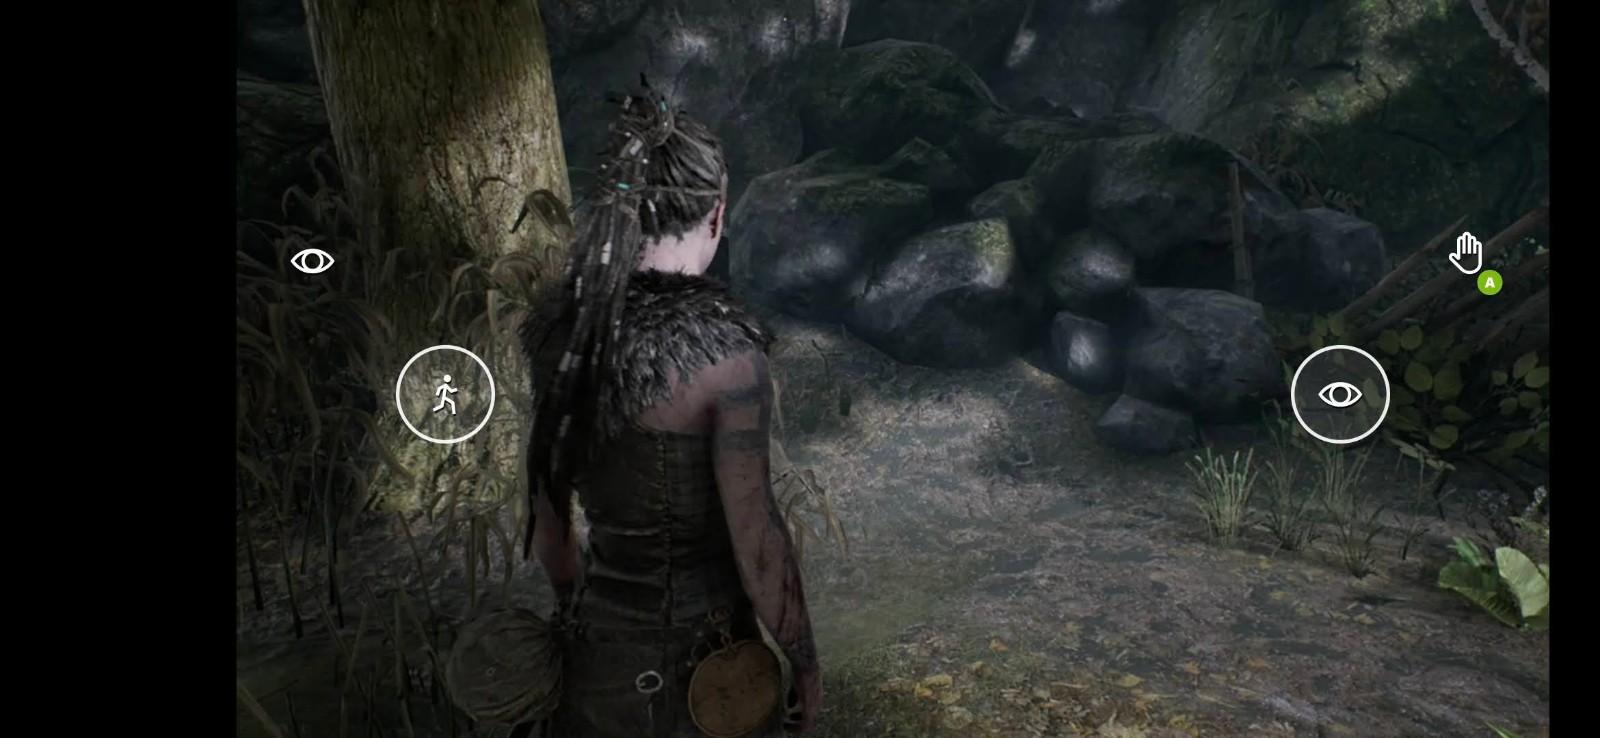 Xbox云游戏IGN 7分 目前还存在一些问题使其不够优秀